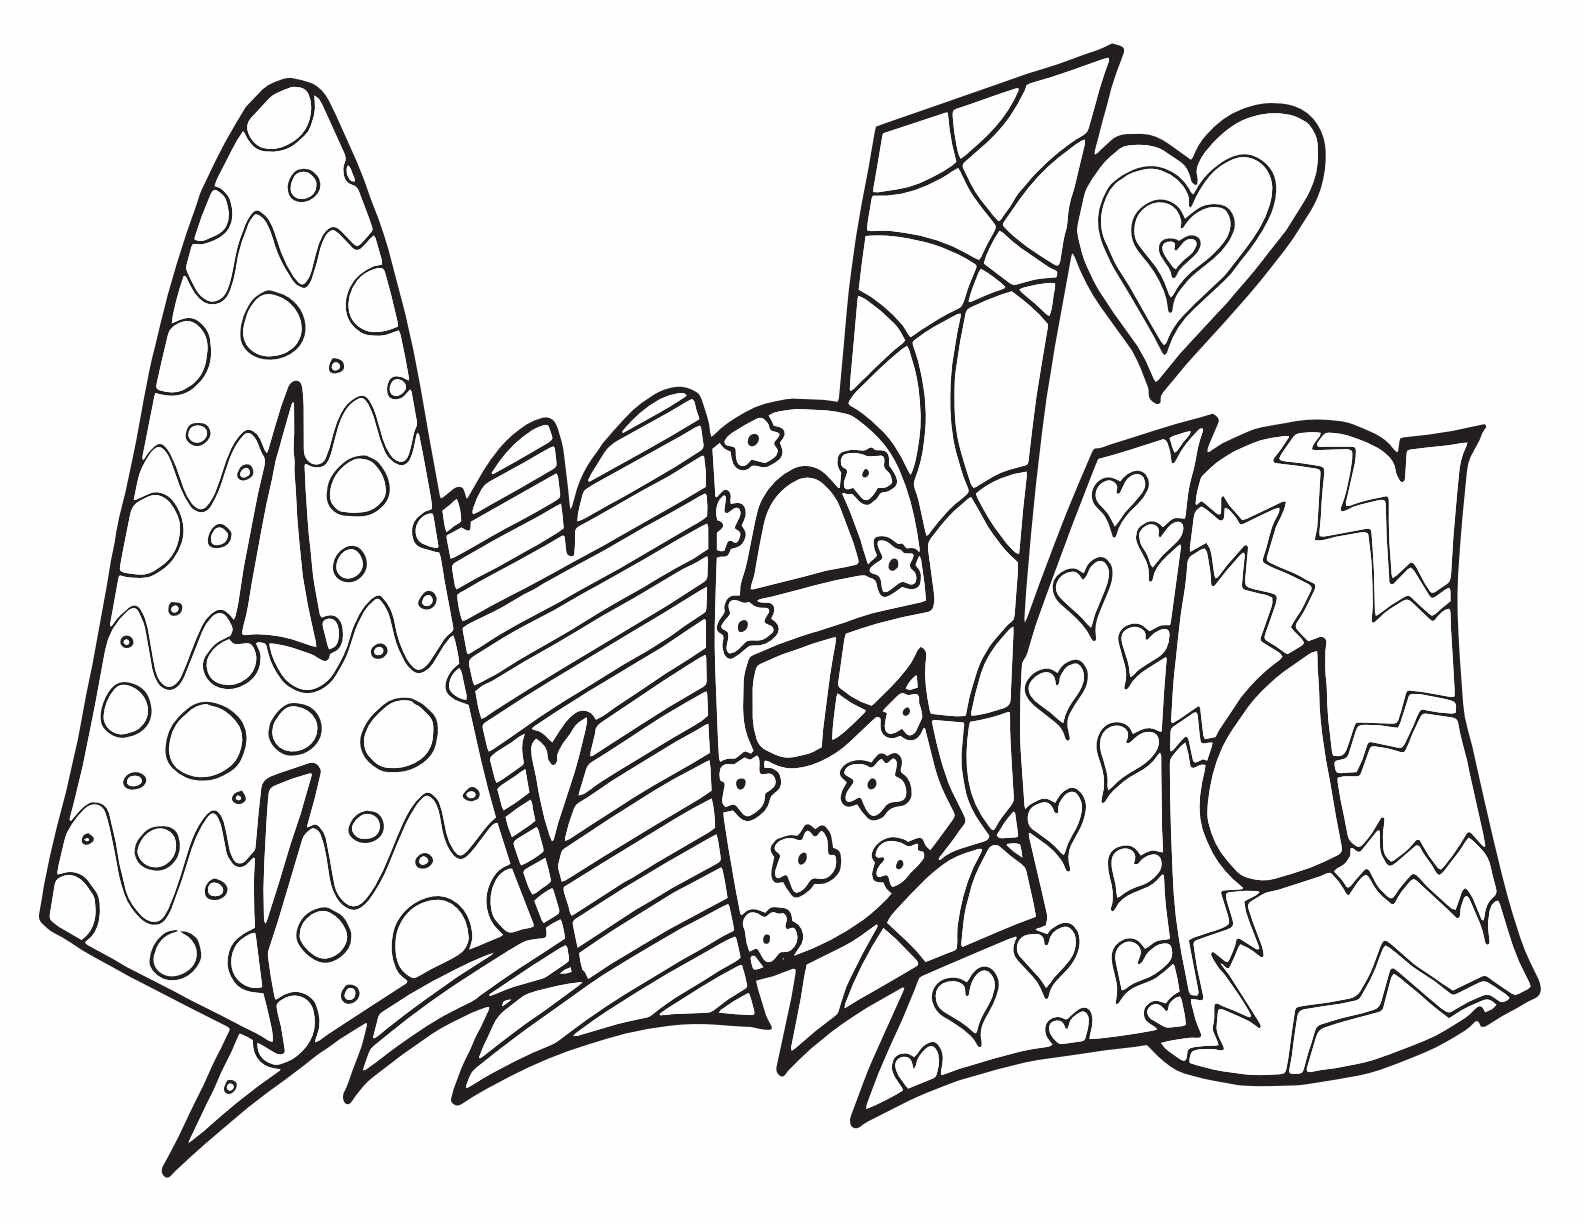 Most Popular Girls Names 2019 Stevie Doodles Unicorn Coloring Pages Name Coloring Pages Free Coloring Pages